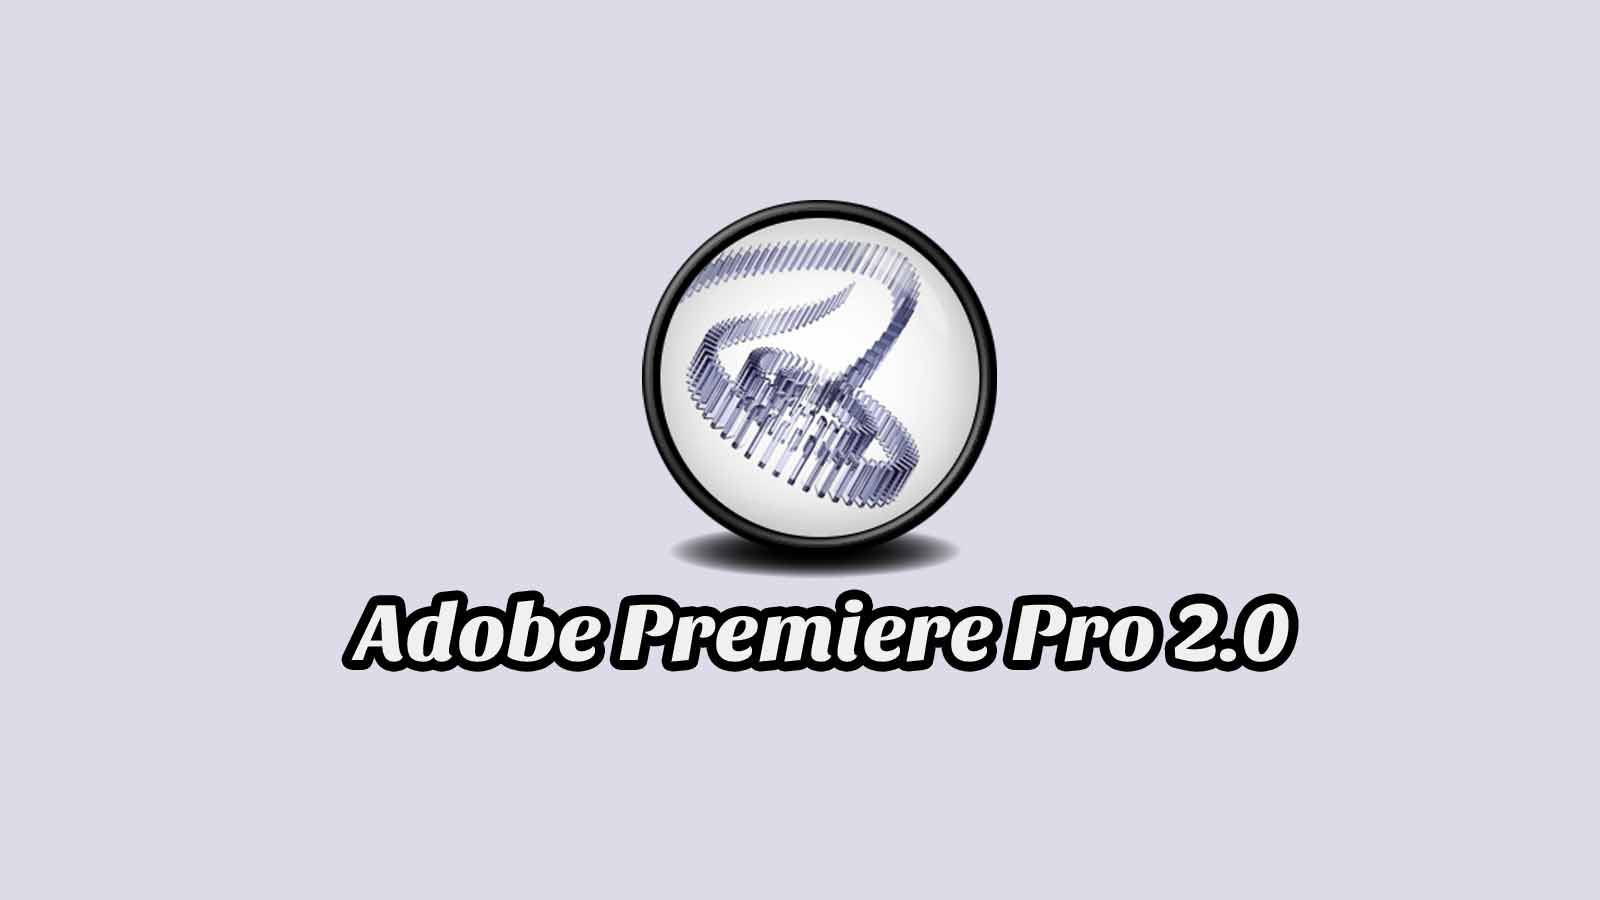 Daftar Isi Adobe Premiere Pro 2.0